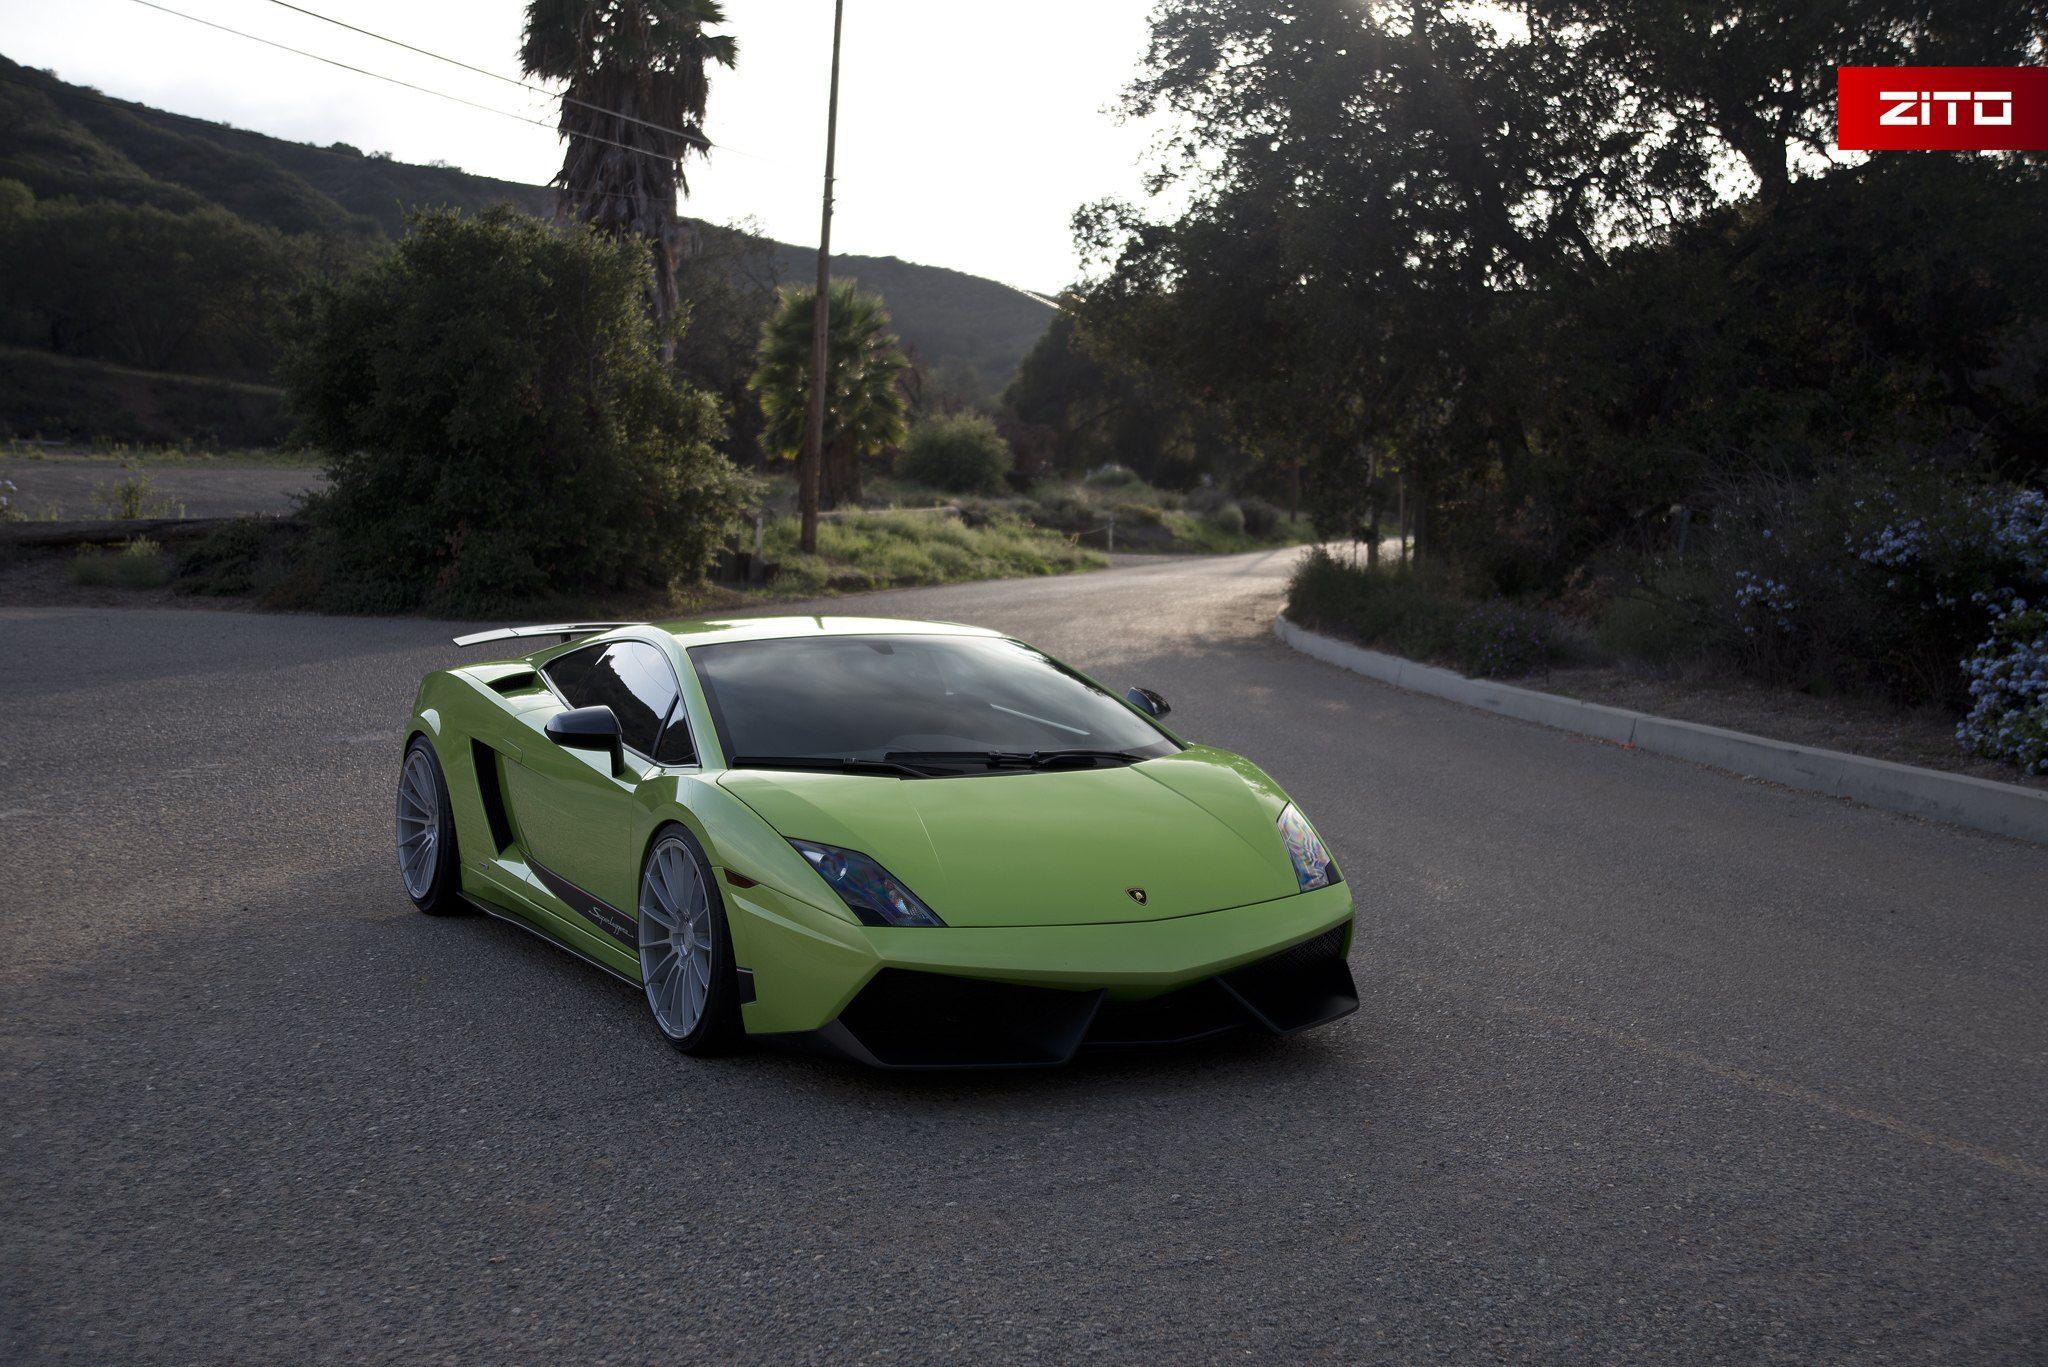 Got Lime Amazing Lamborghini Gallardo With Rear Wing Spoiler Car